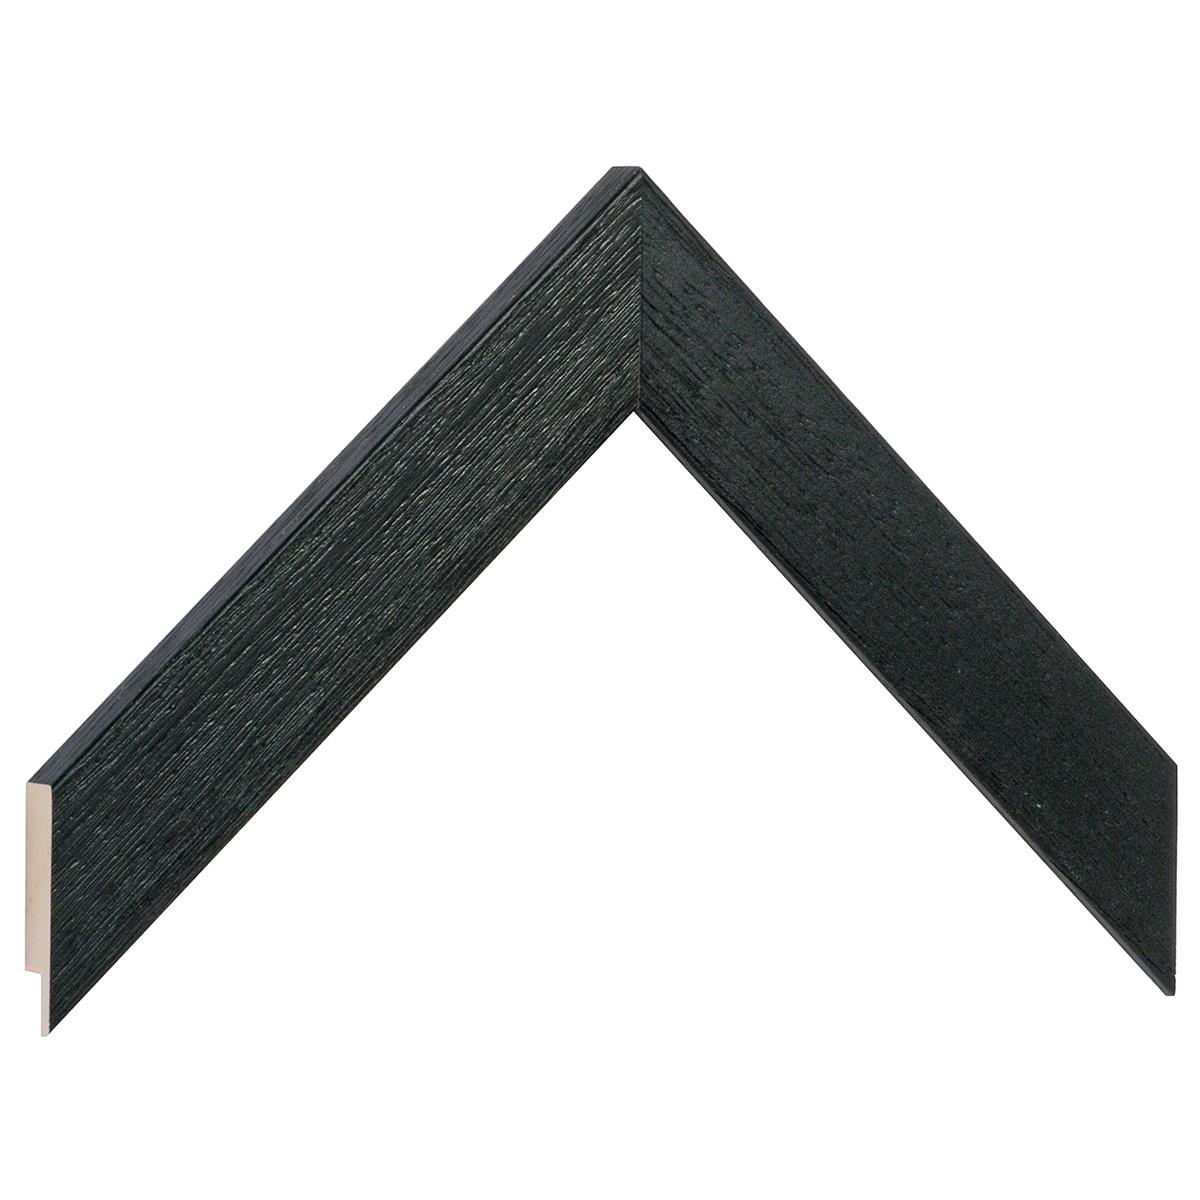 Moulding ayous, width 30mm height 14 - black, open grain